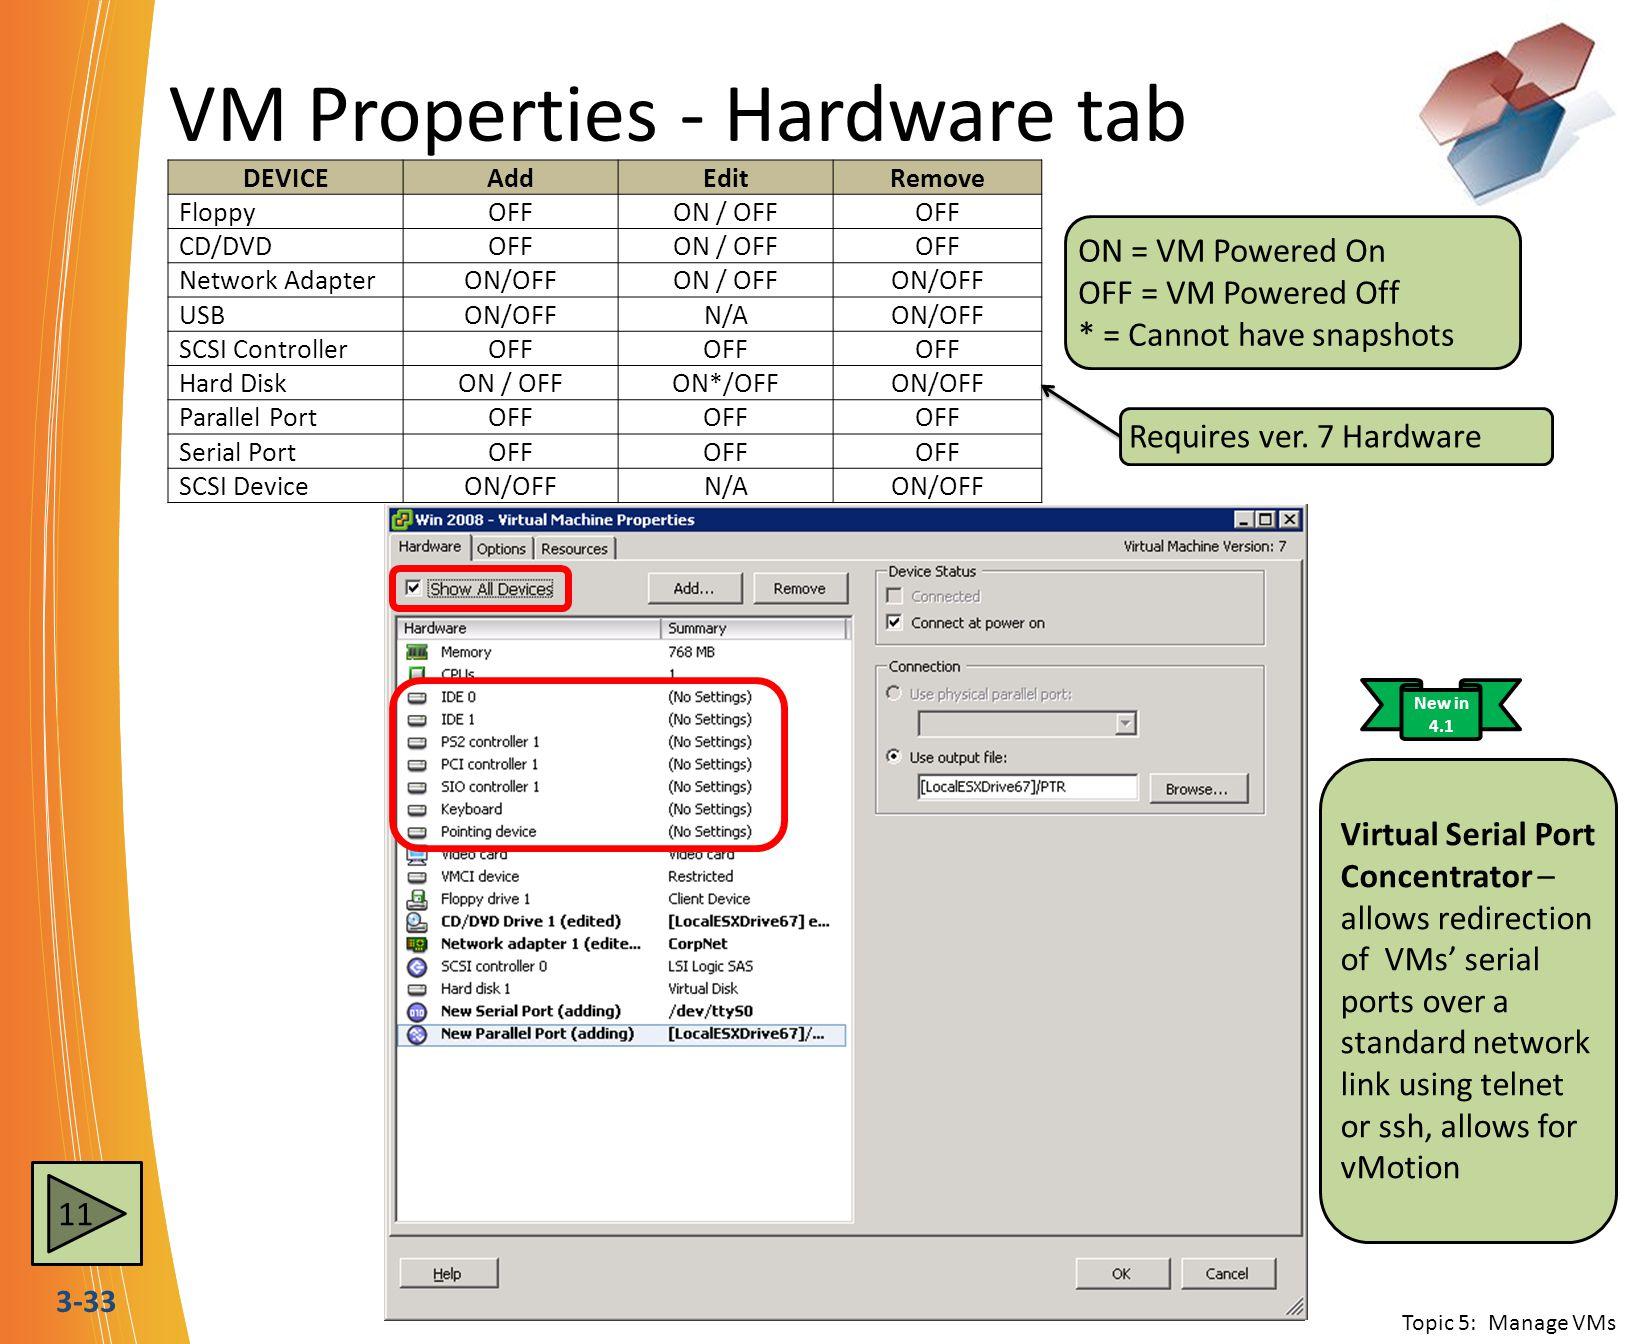 3-33 VM Properties - Hardware tab Topic 5: Manage VMs DEVICEAddEditRemove FloppyOFFON / OFFOFF CD/DVDOFFON / OFFOFF Network AdapterON/OFF USBON/OFFN/A